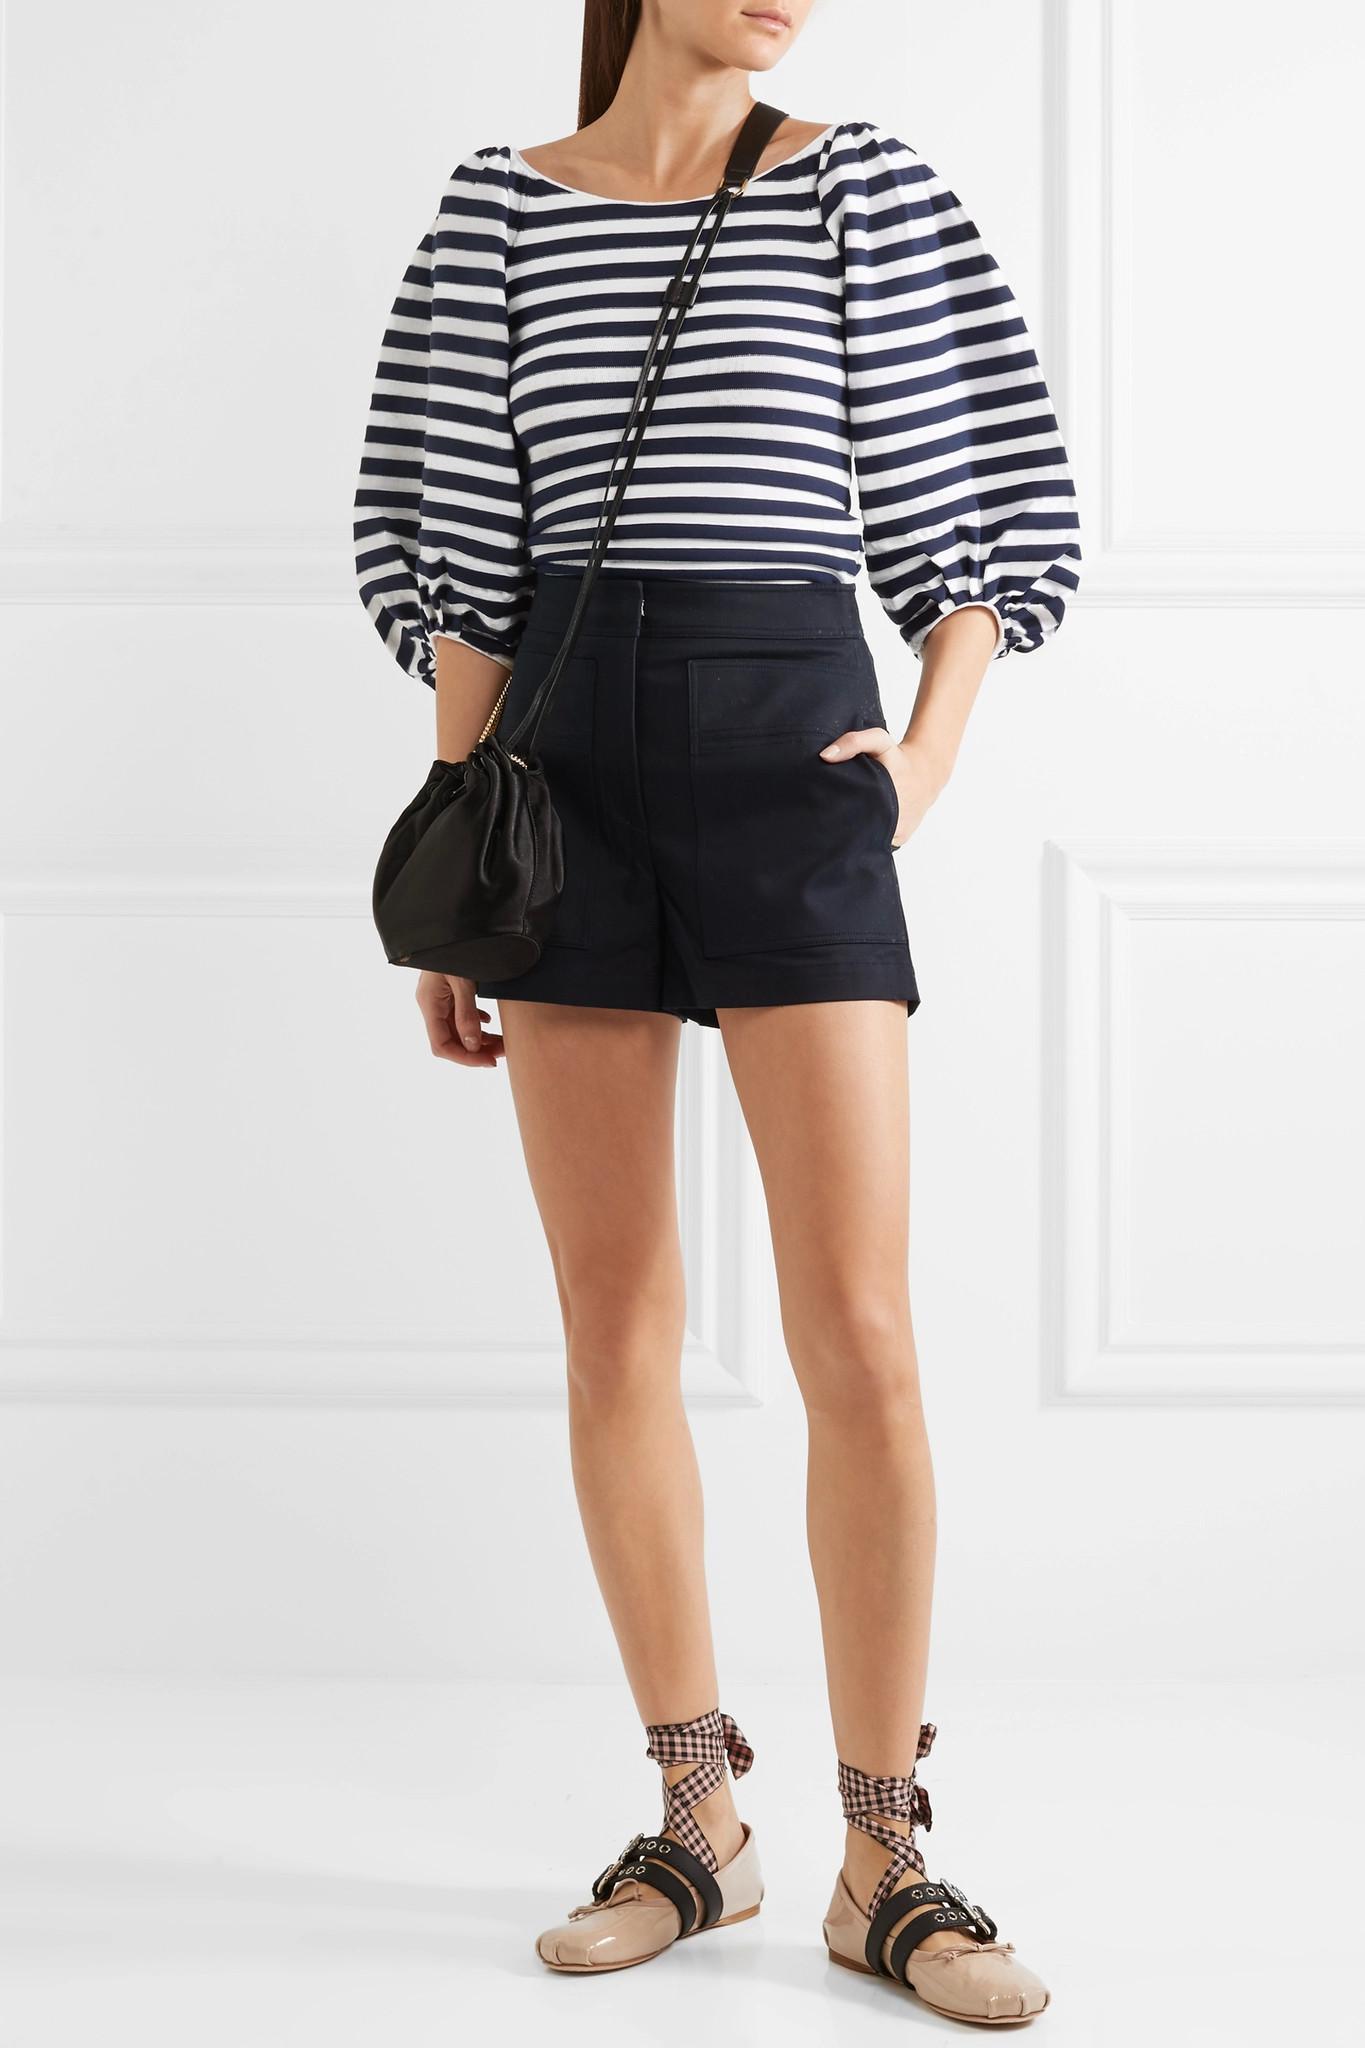 lyst sonia rykiel striped cotton blend top in blue